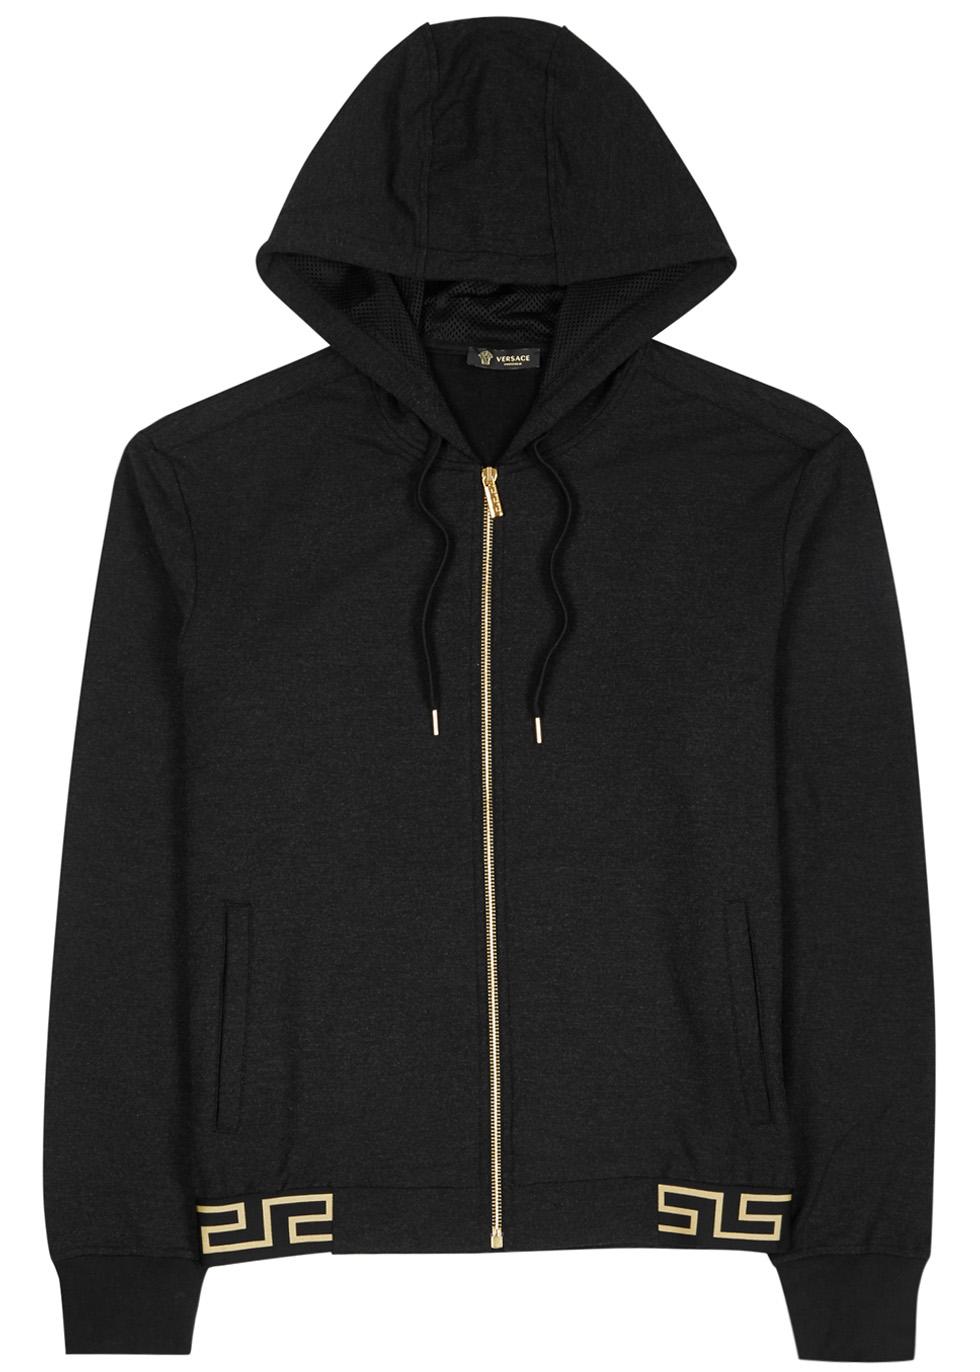 Black hooded modal blend sweatshirt